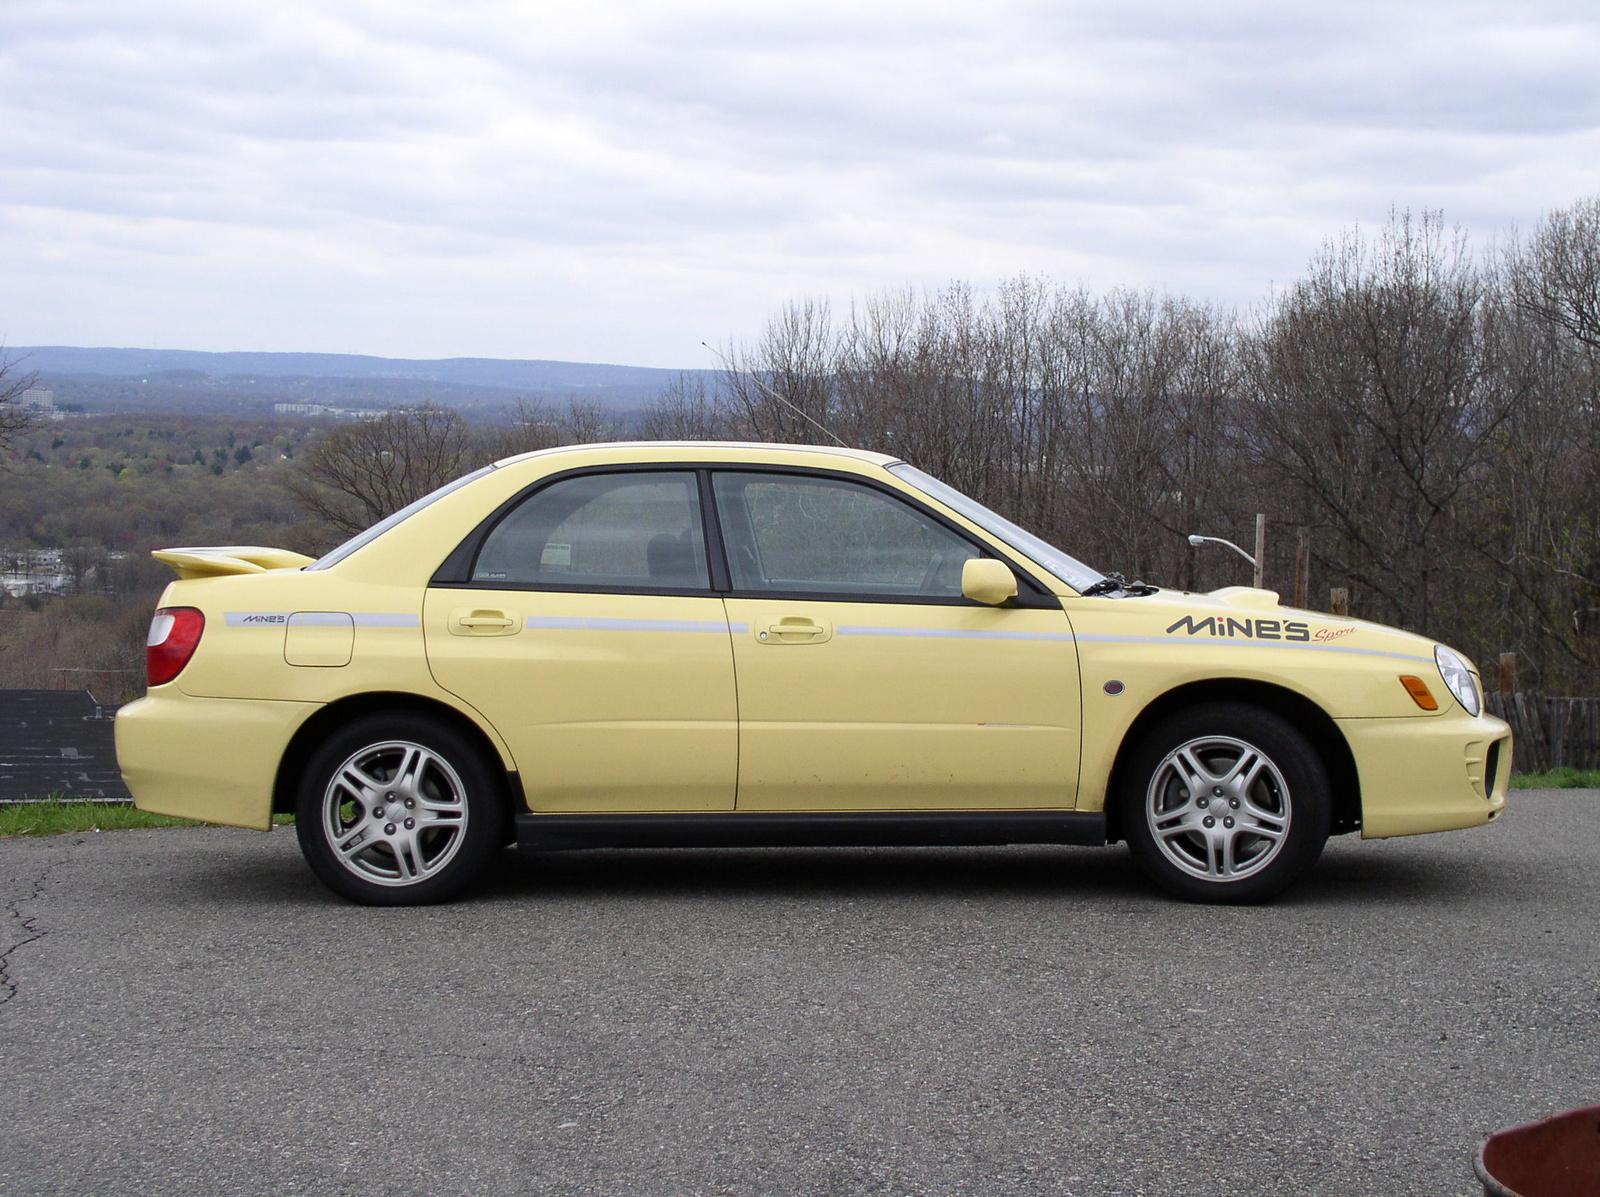 2002 Subaru Crosstrek Hybrid